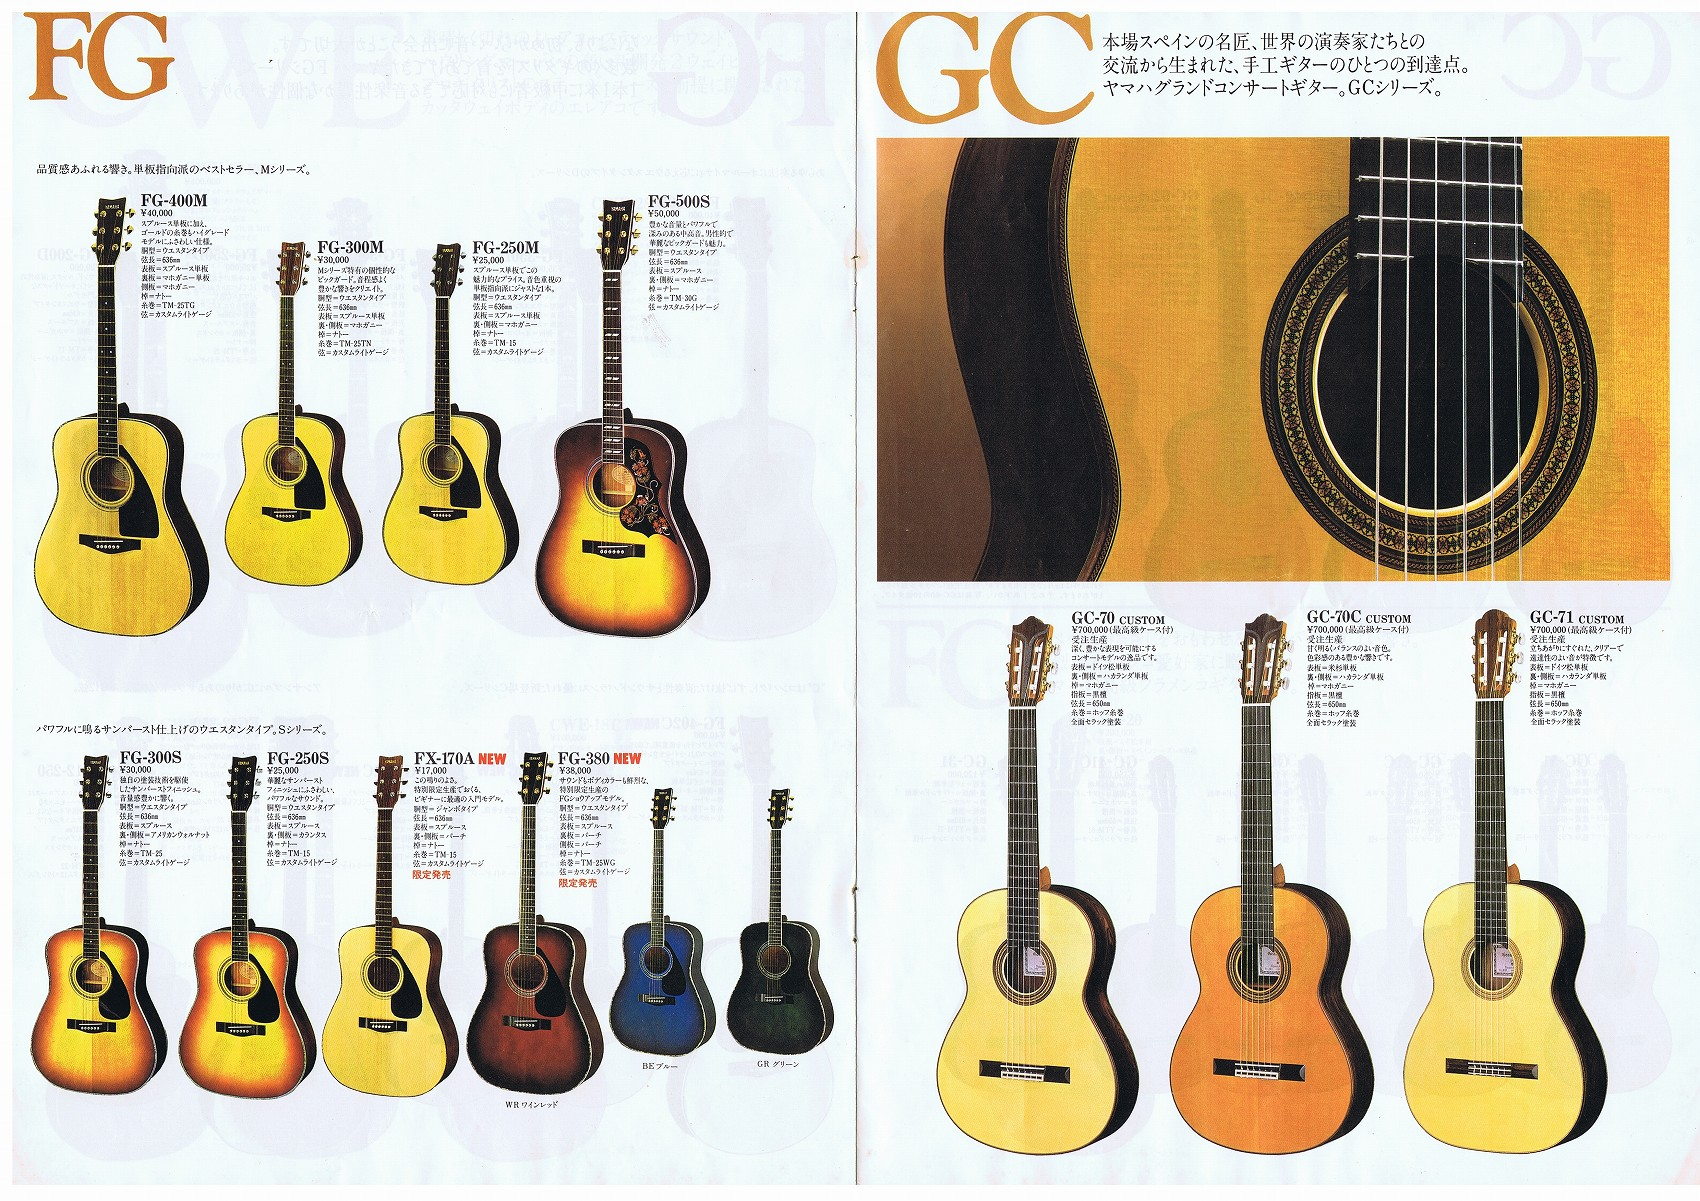 Yamaha Guitar Cg